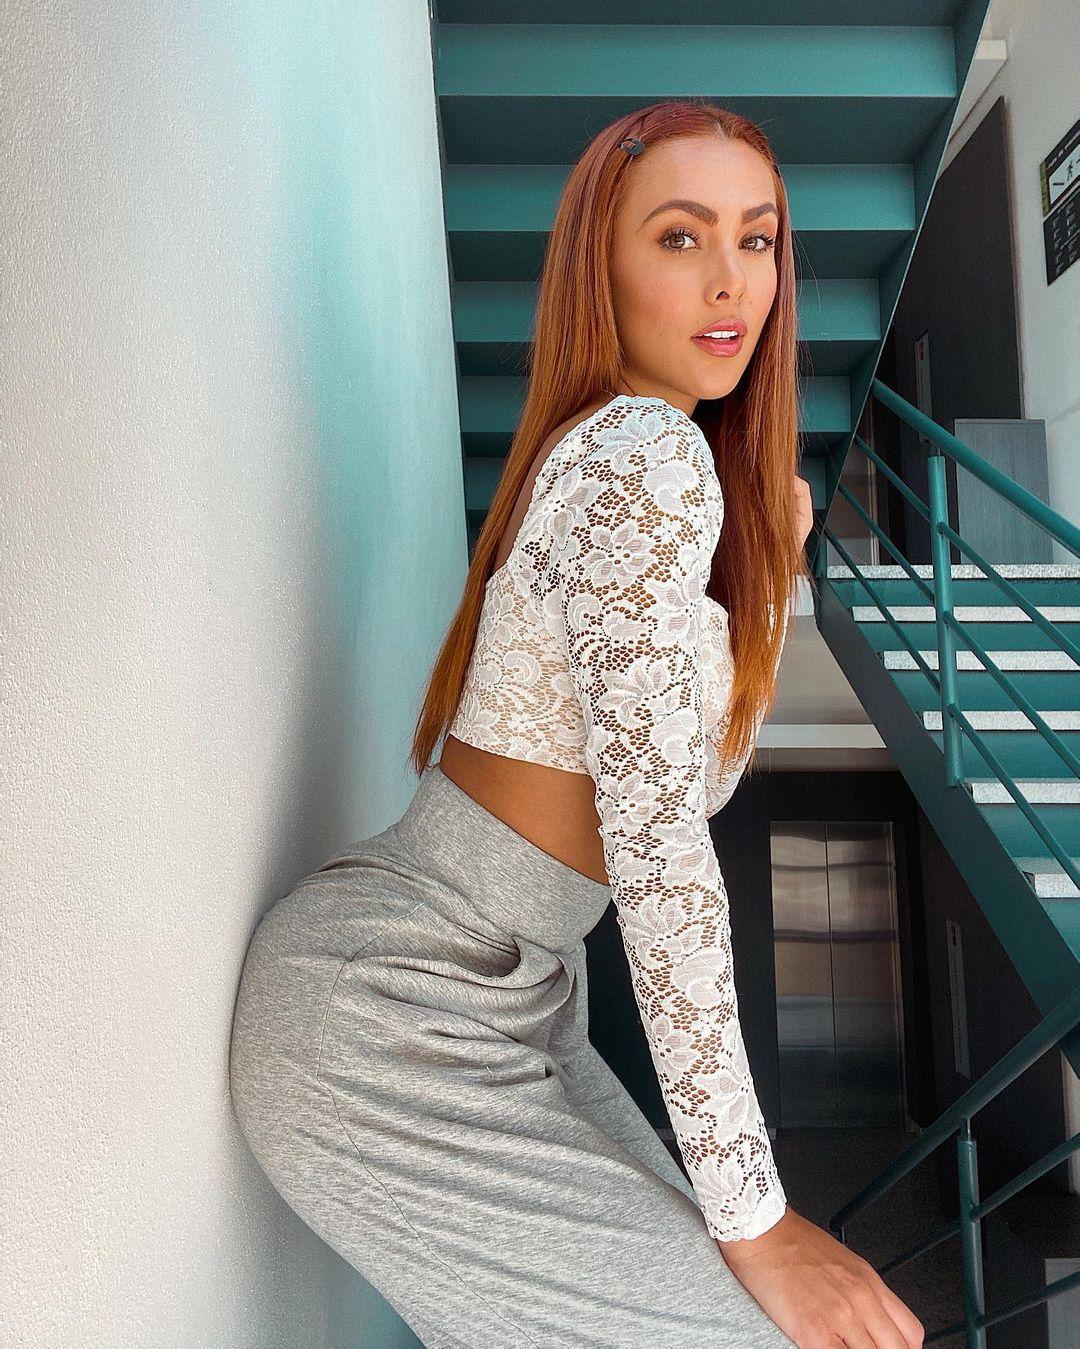 Karina-Ramos-Wallpapers-Insta-Fit-Bio-9